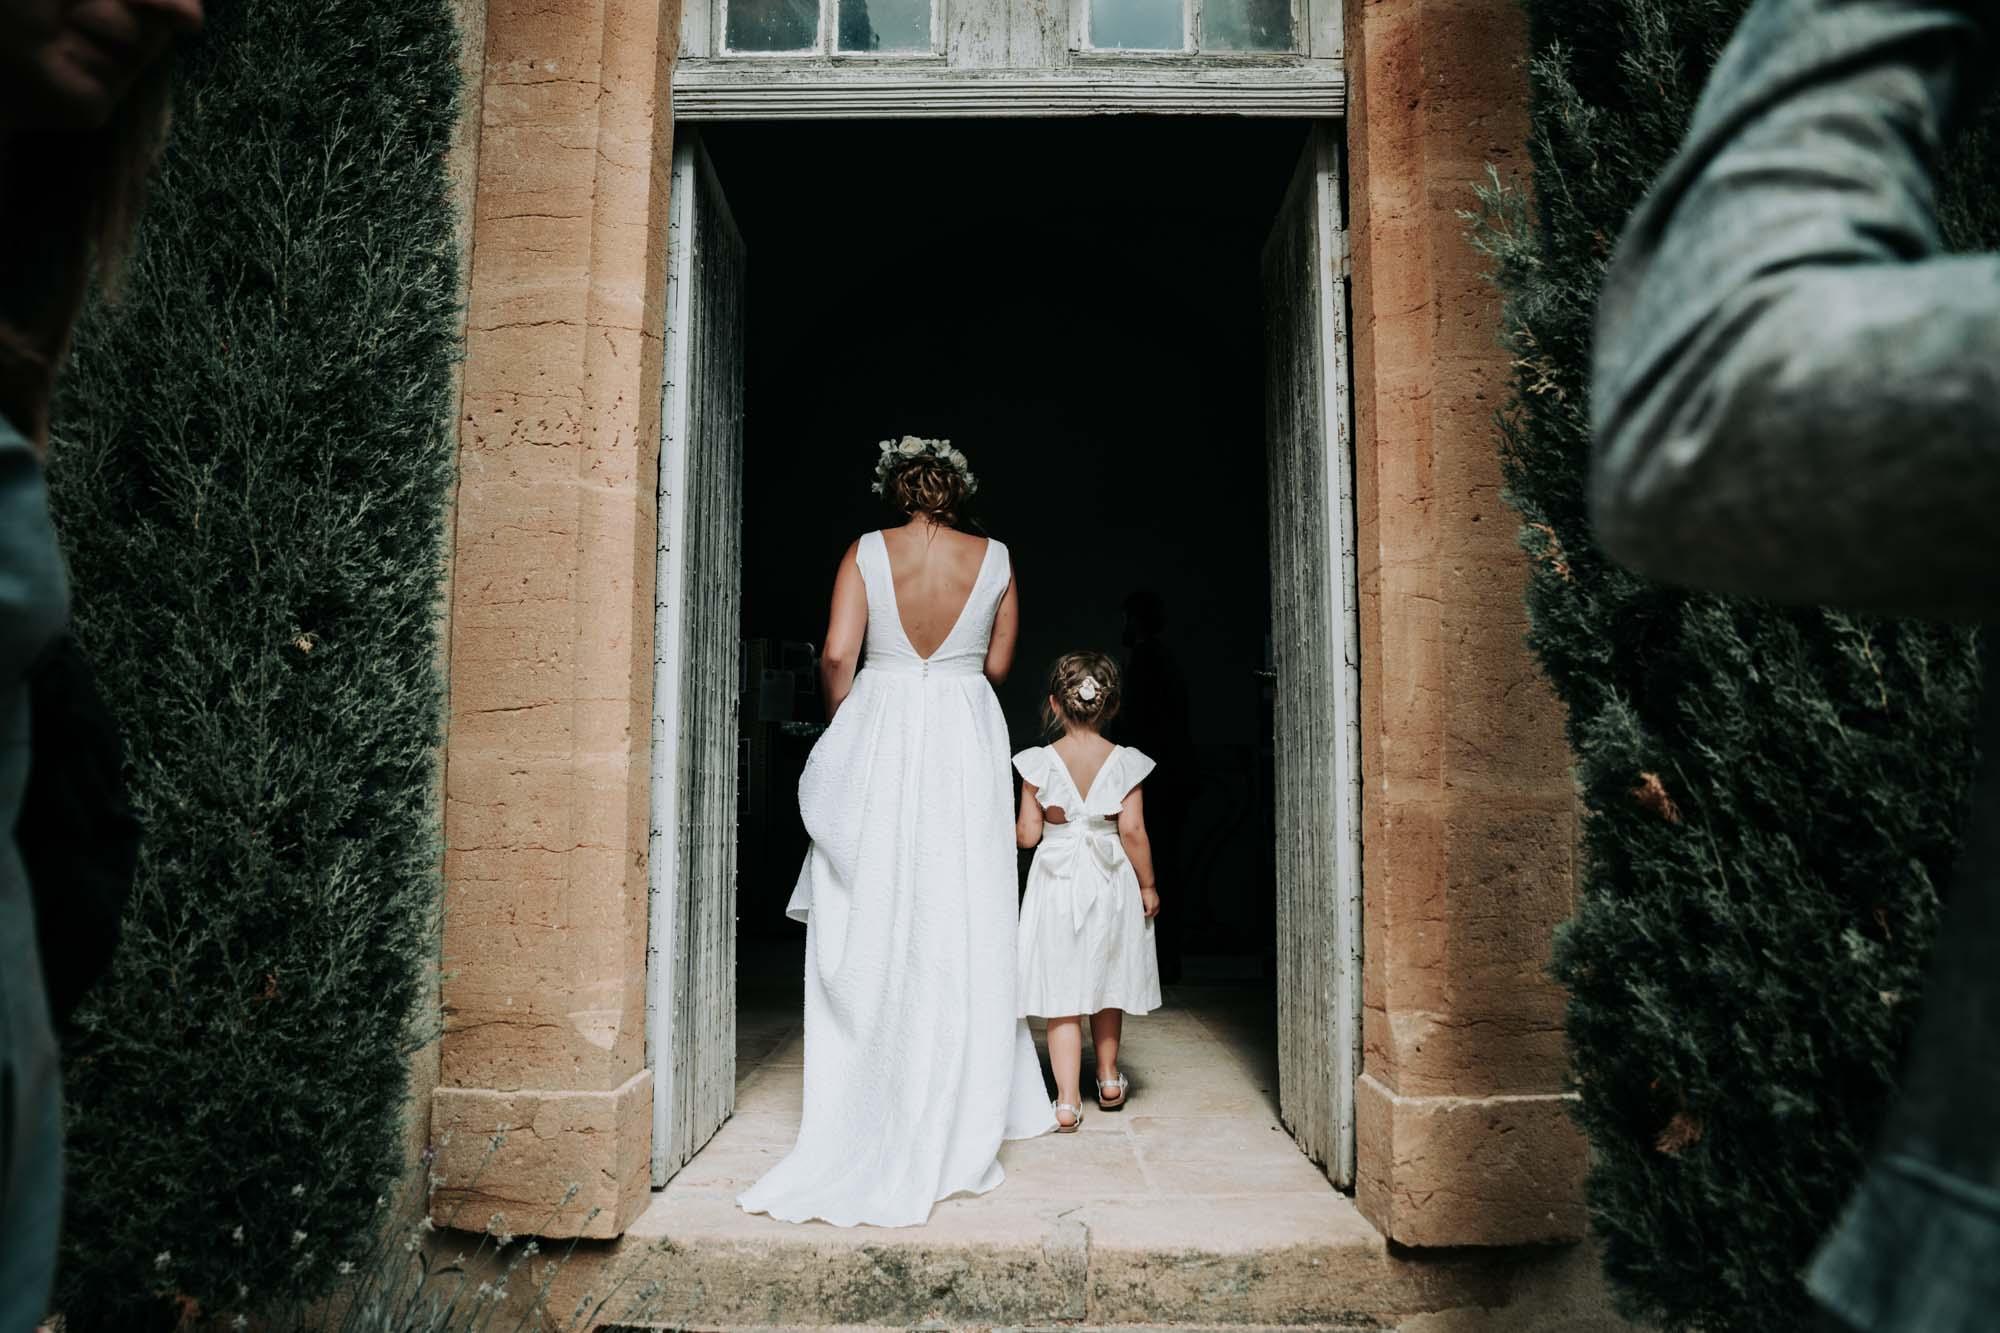 2018-07-21 - LD8_0145 - photographe mariage lyon - laurie diaz - www.lauriediazweeding.com.jpg